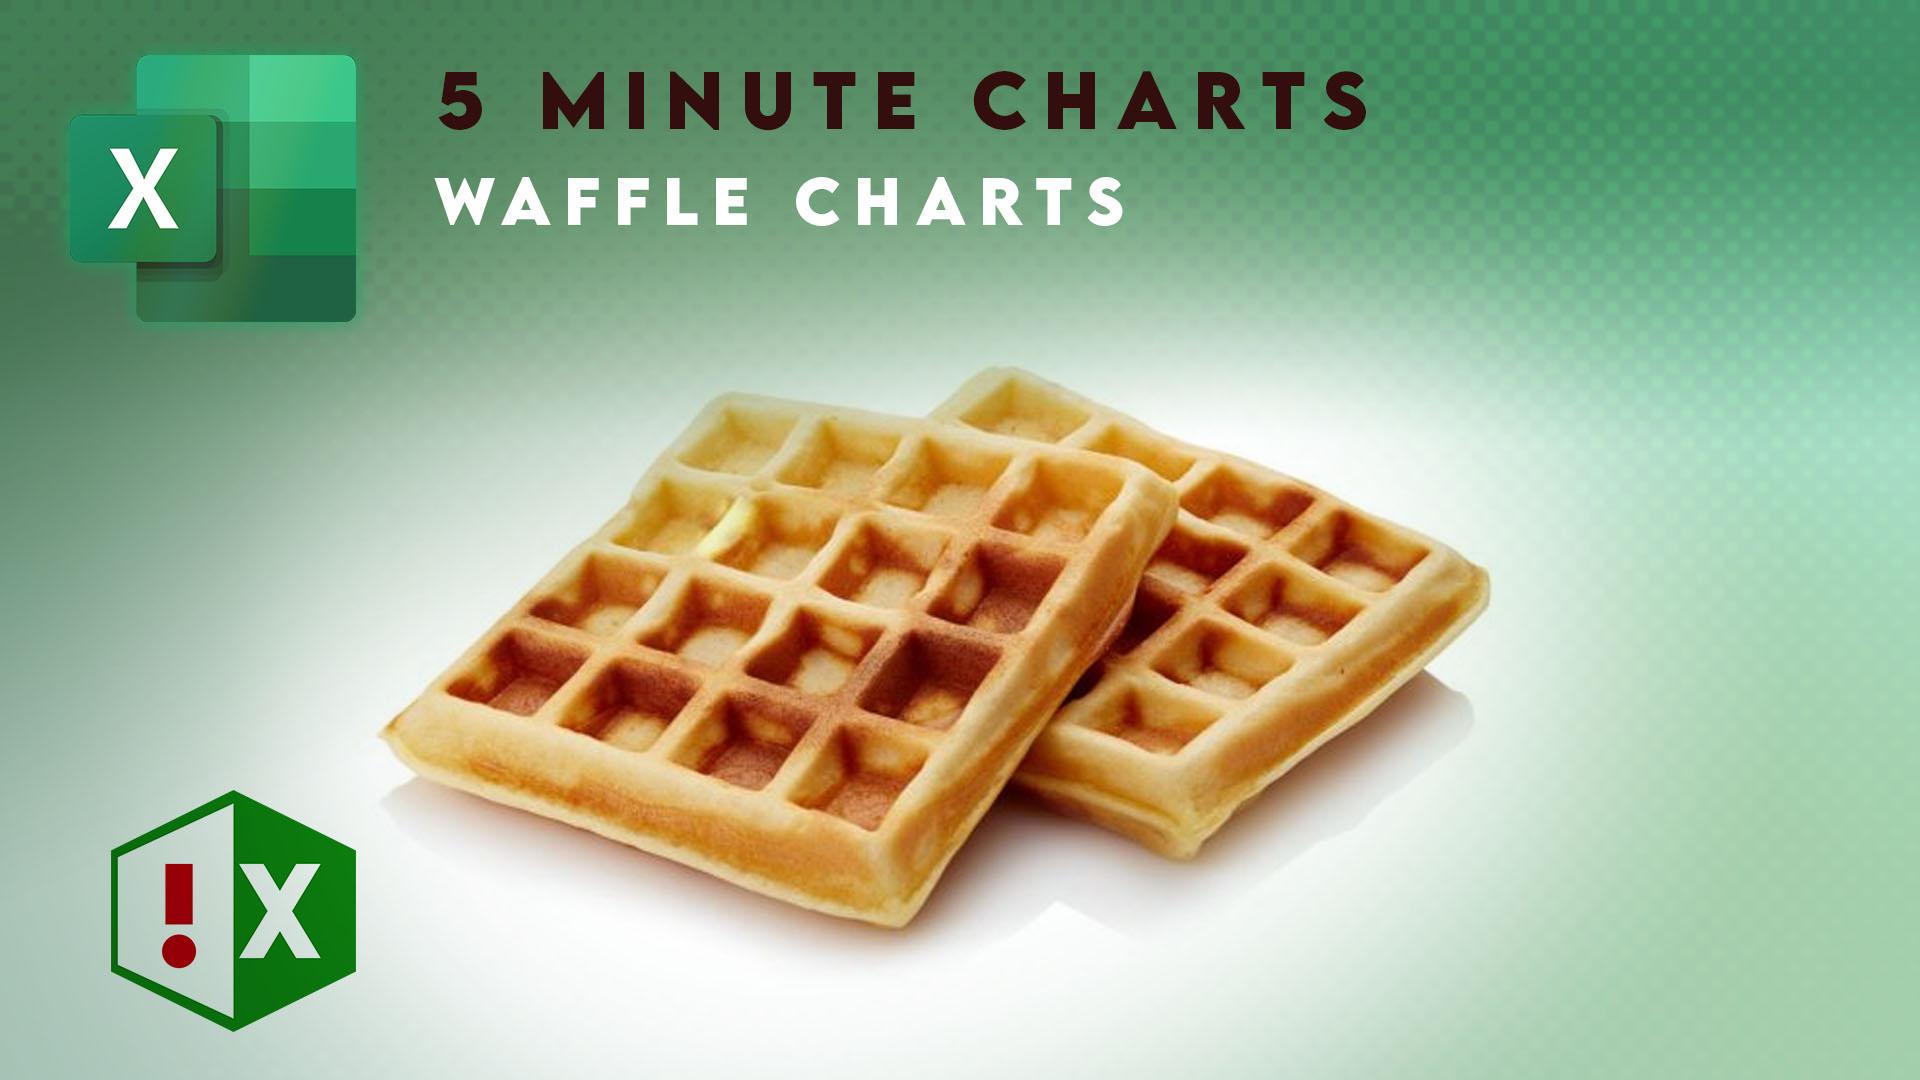 Video - Waffle Charts